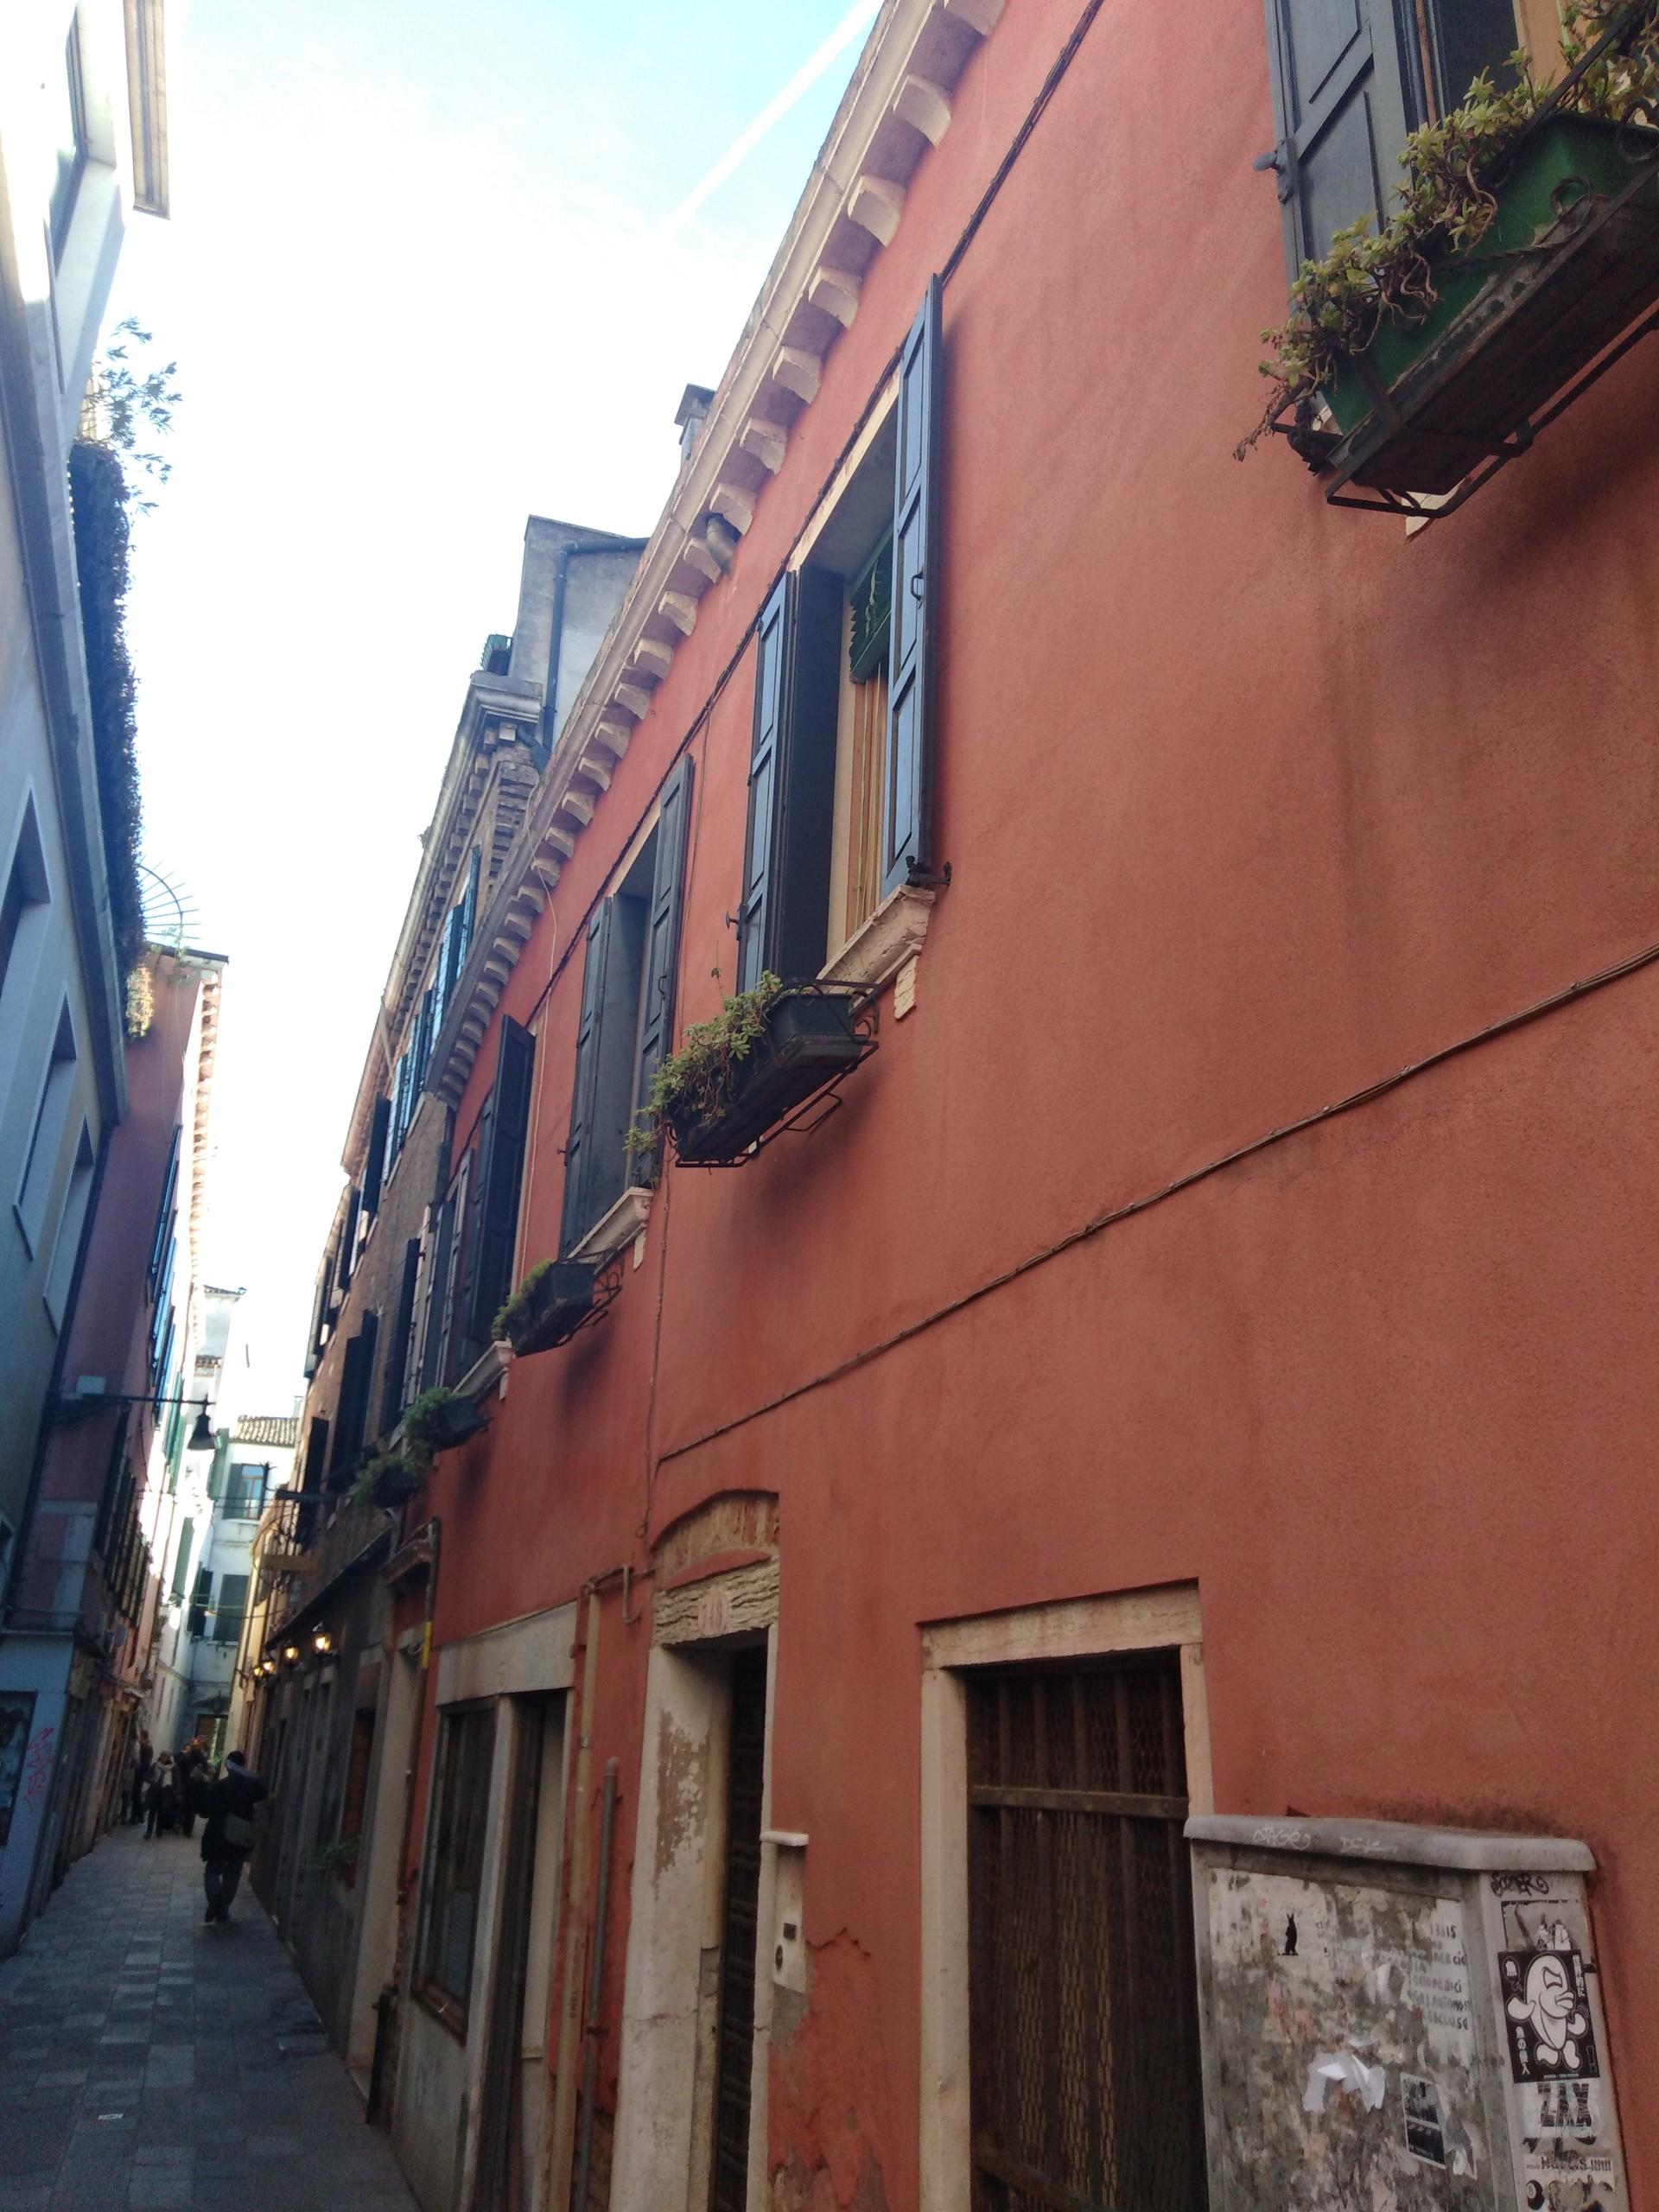 Venice in 12 Hours